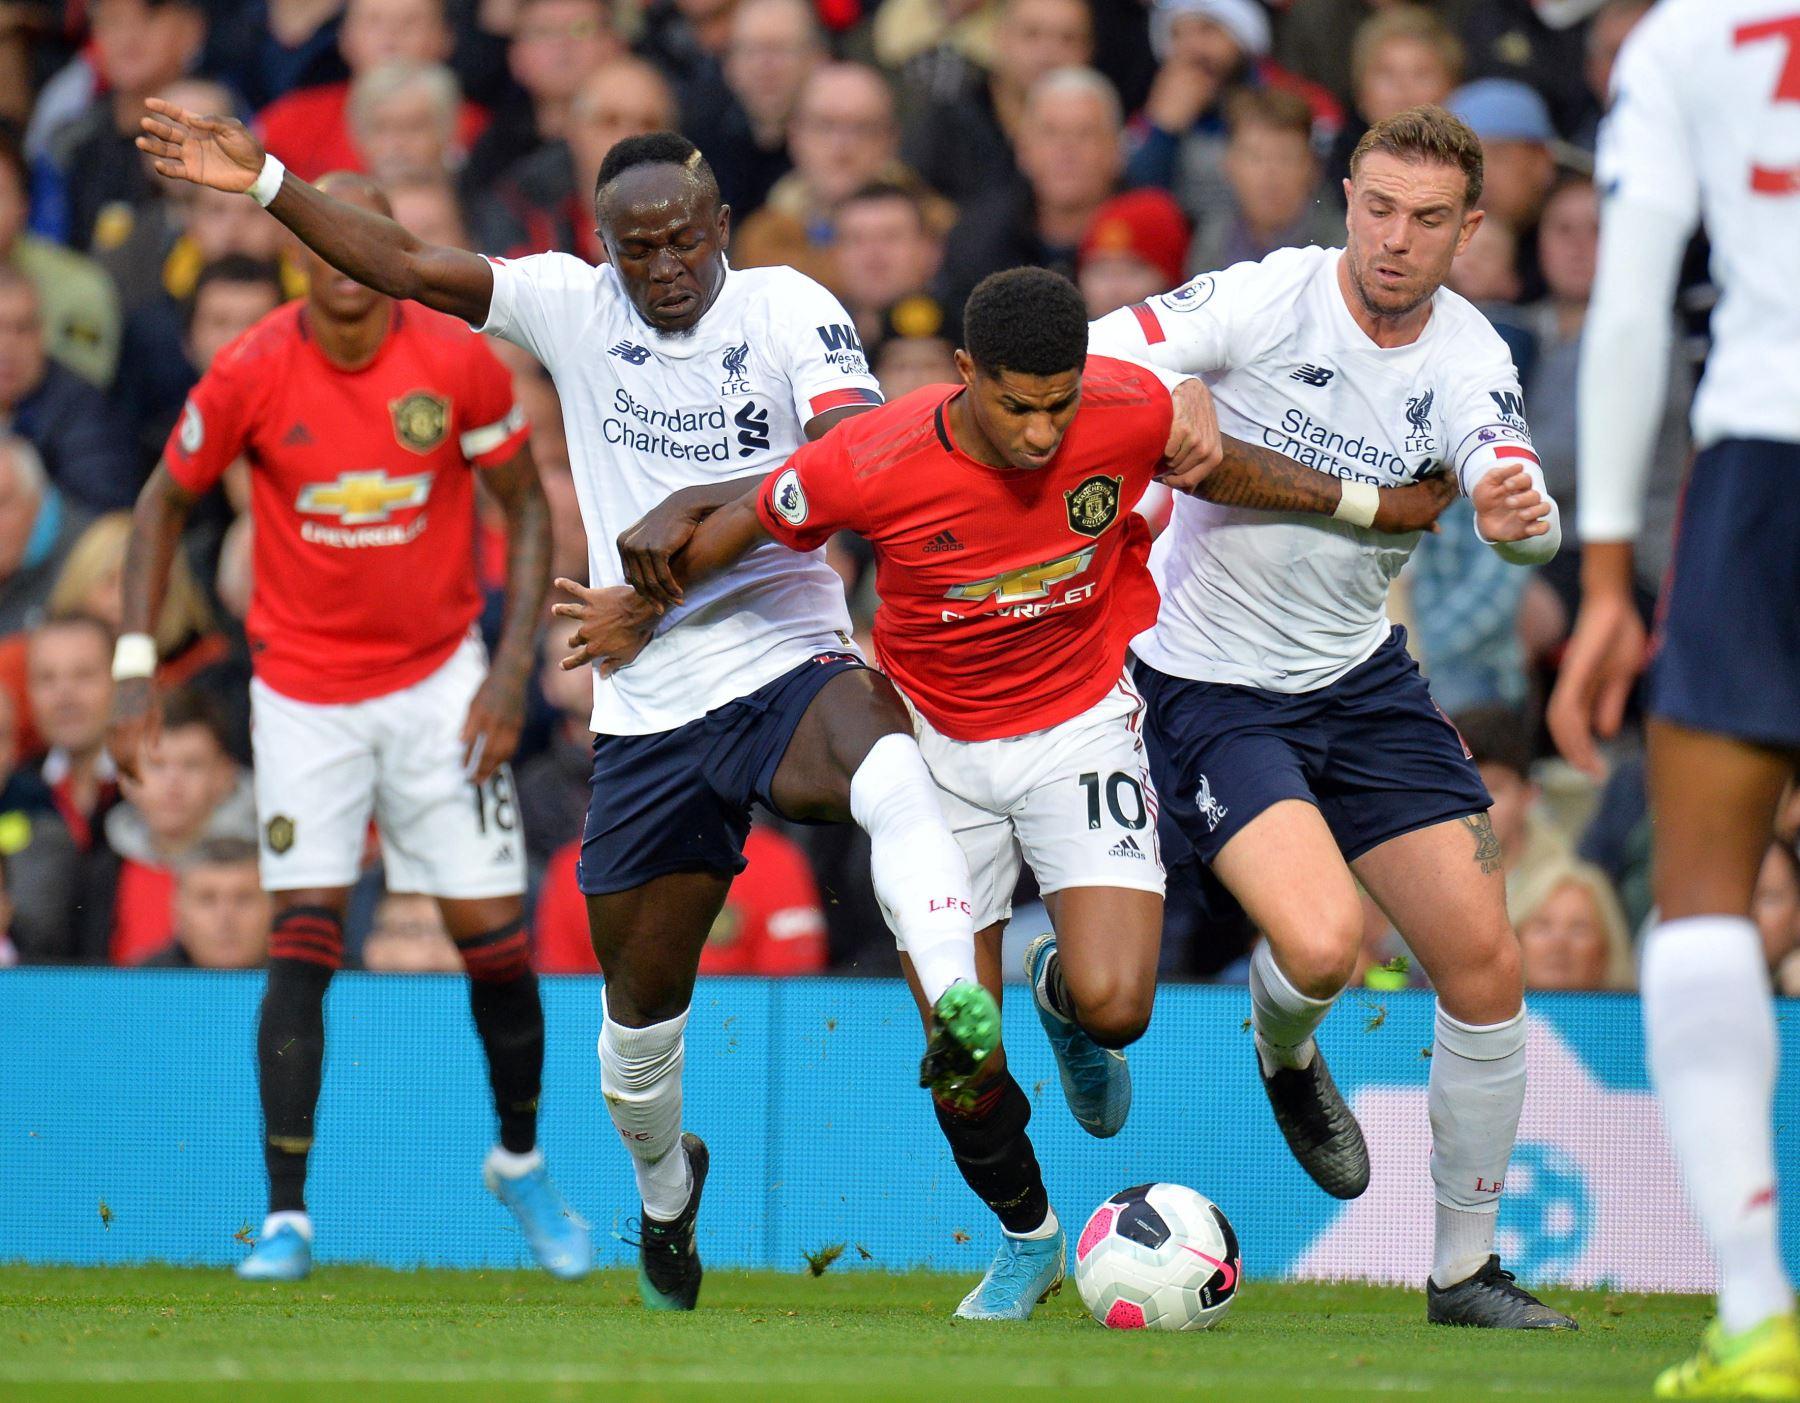 Marcus Rashford del Machester United evita fuerte marca del Liverpool. Foto: EFE